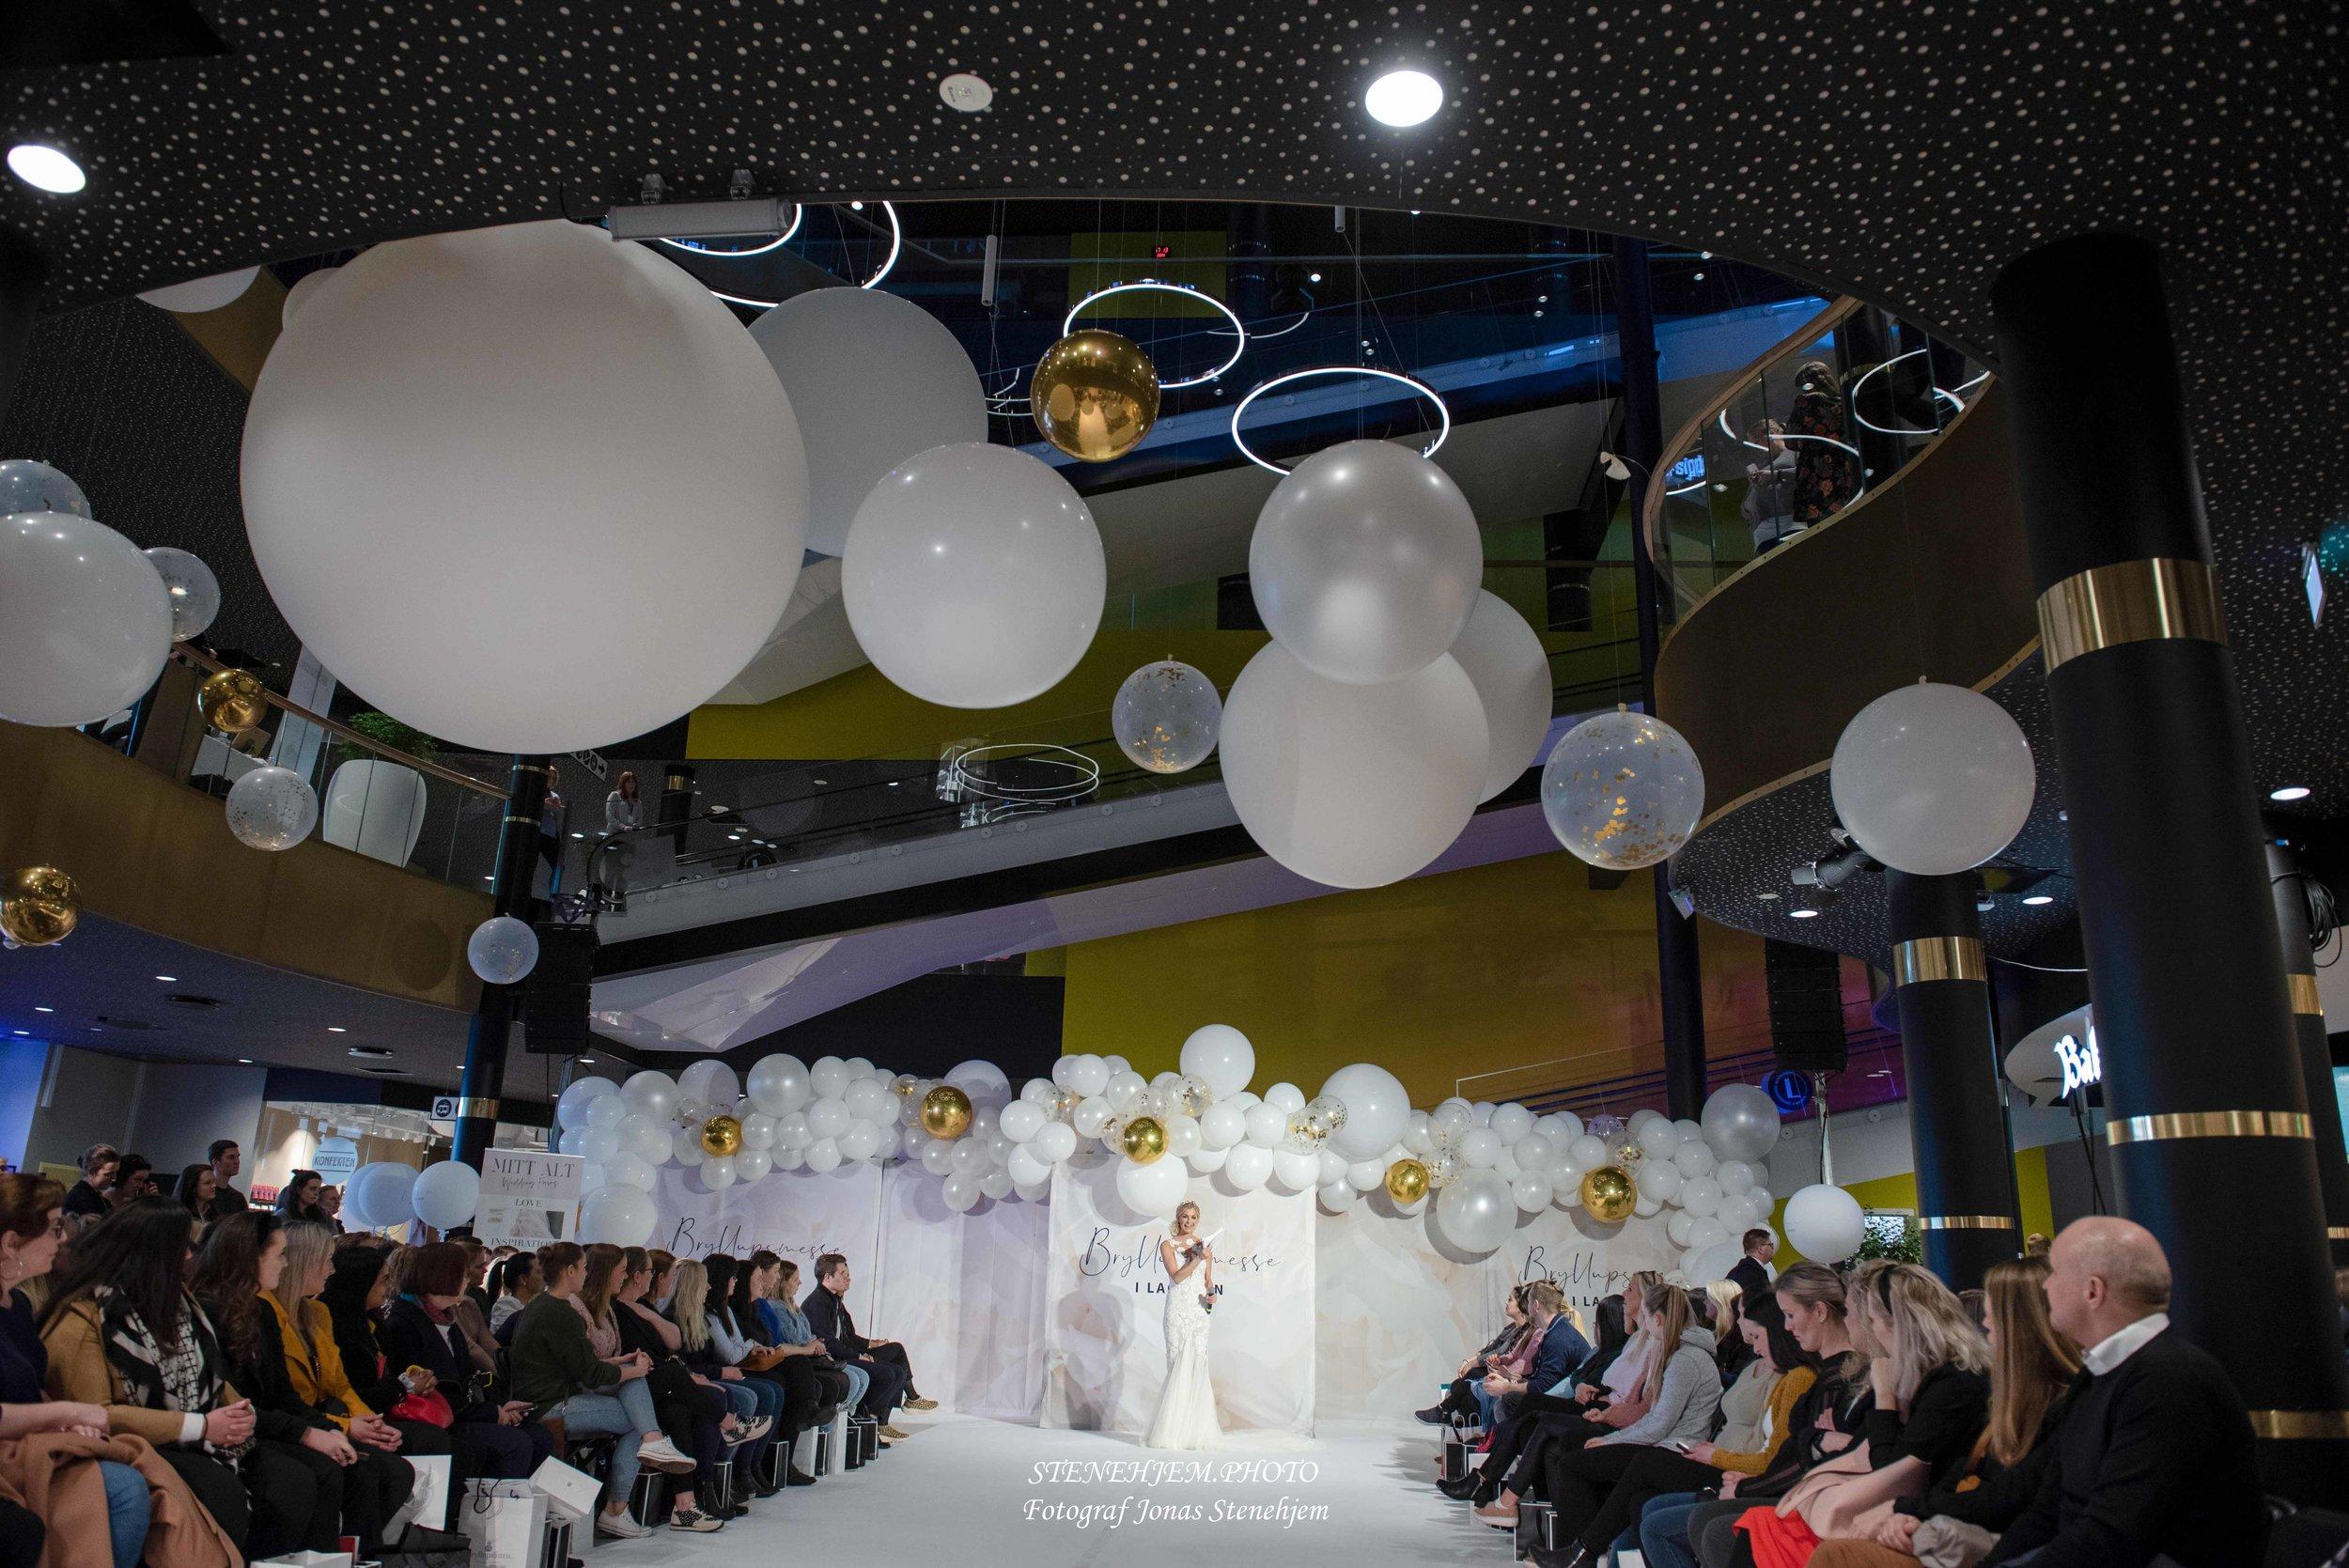 Bryllupsmesse_Lagunen_mittaltweddingfair__099.jpg